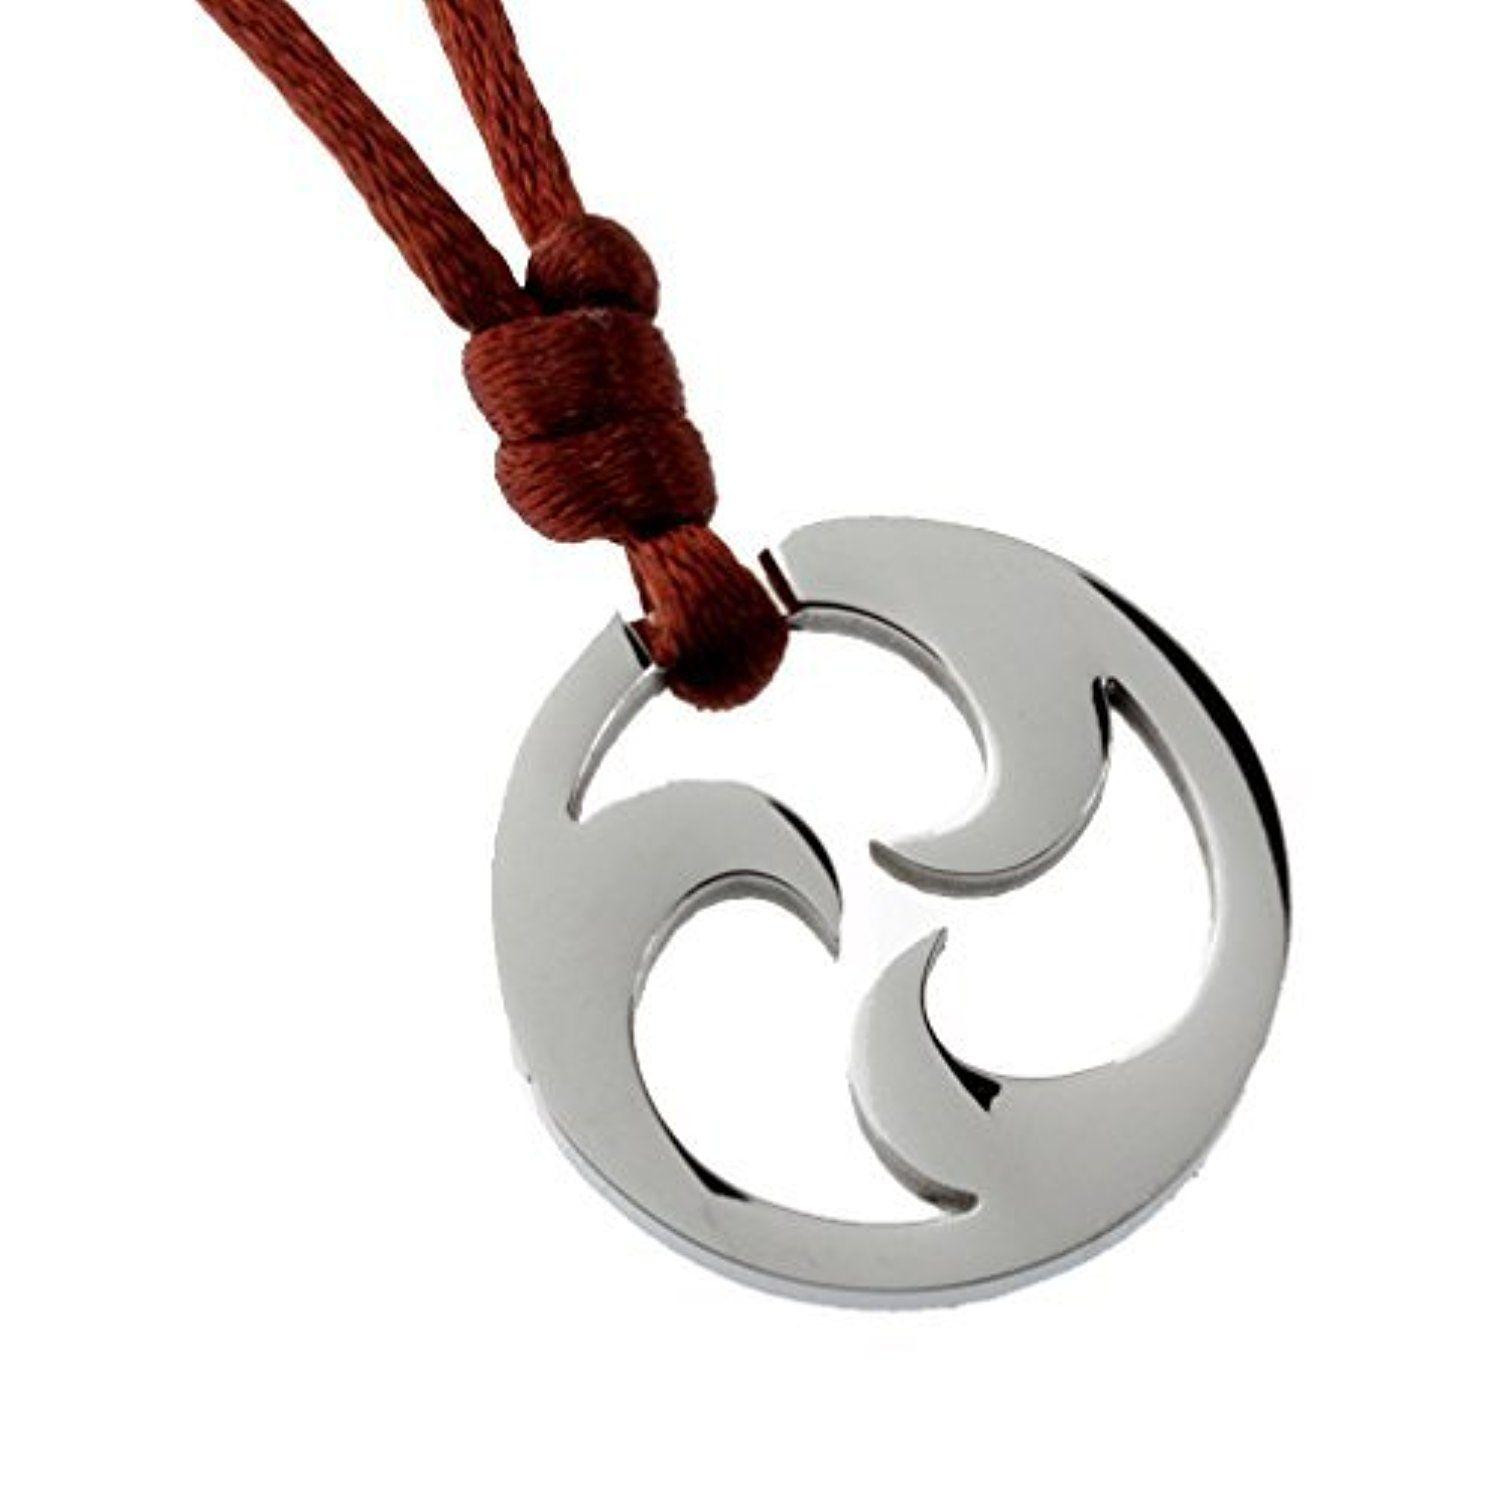 Rh jewelry stainless steel the koru tribal braided rope necklace